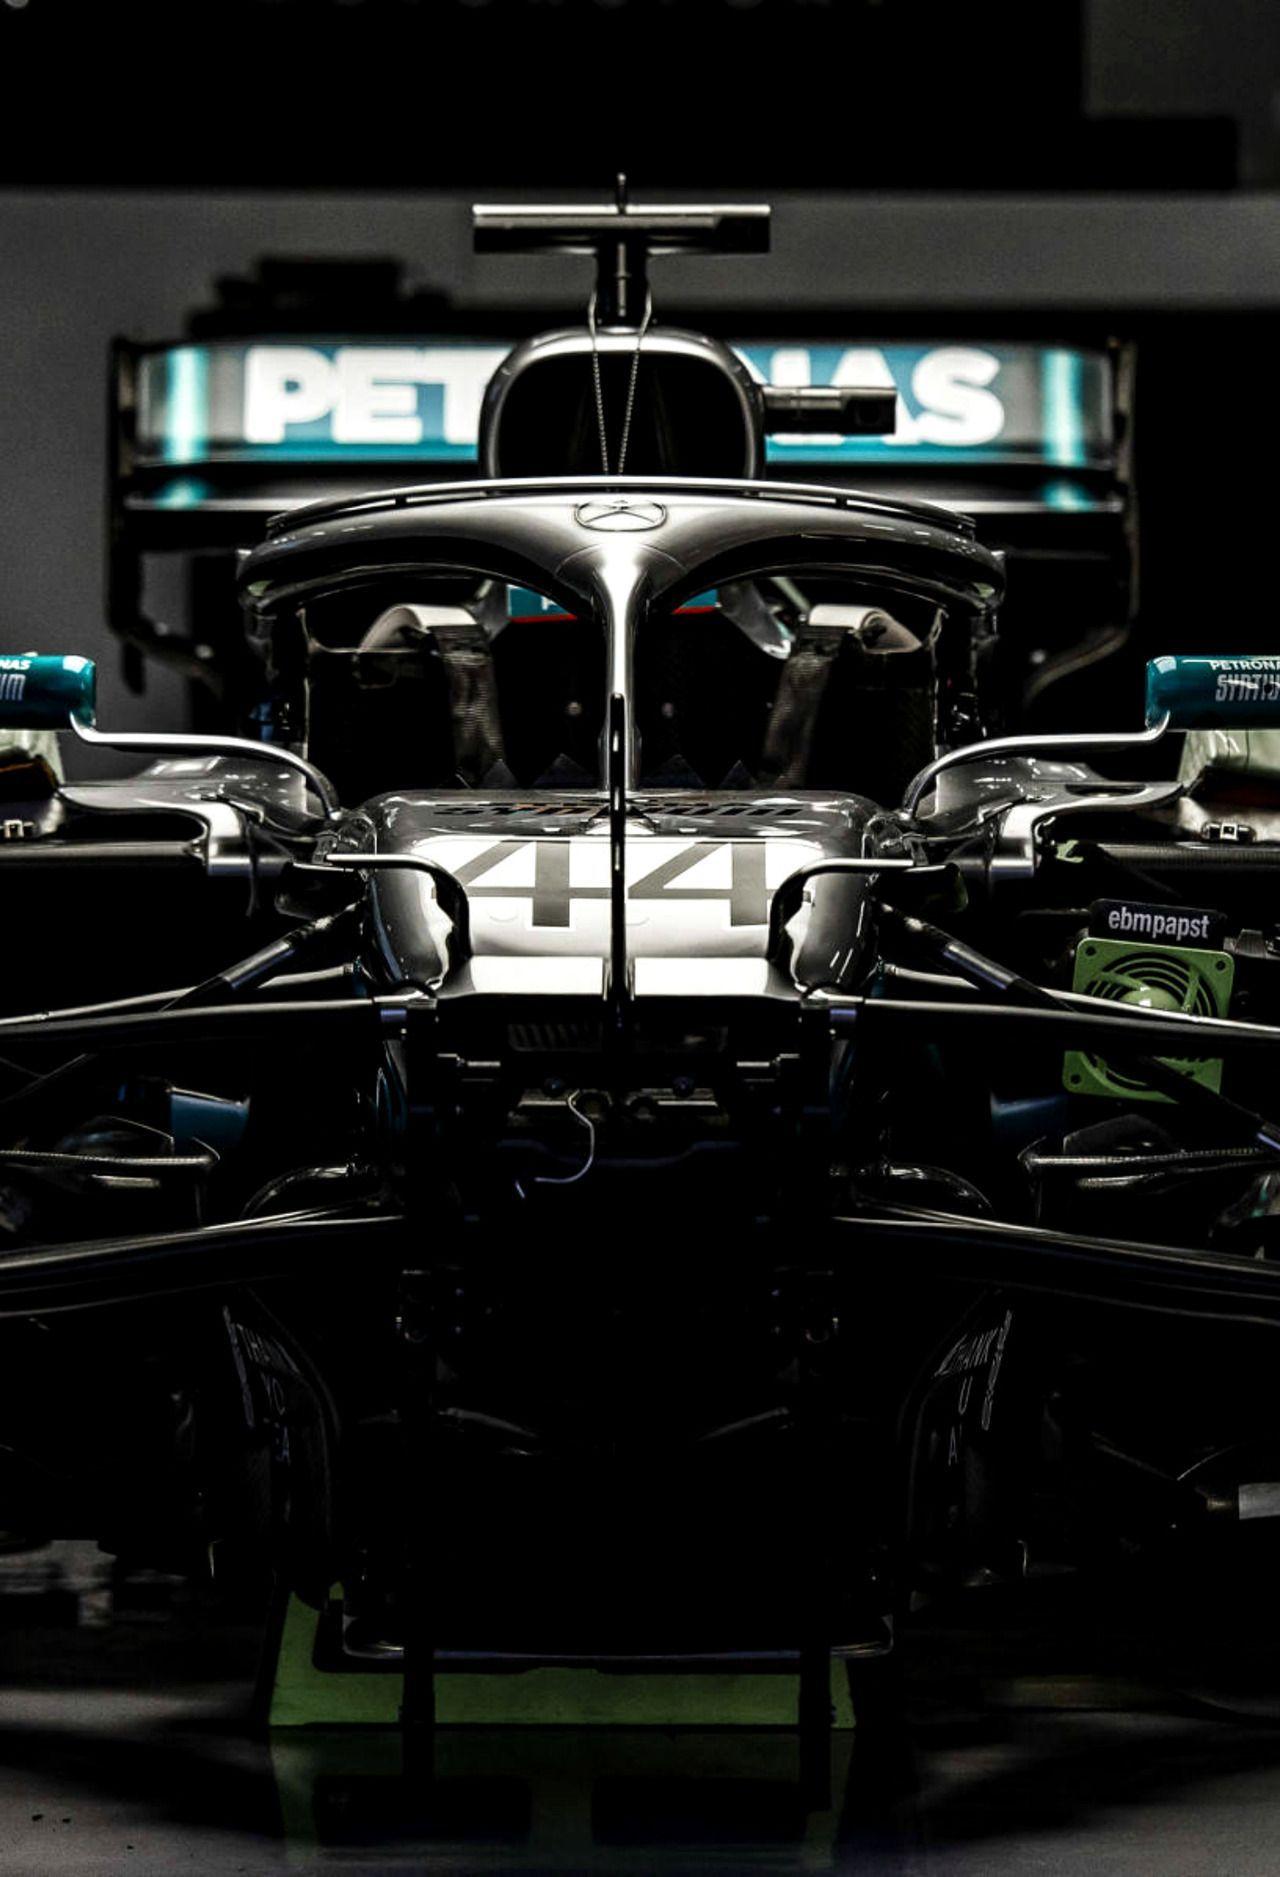 Mercedes F1 Wallpaper 2019 Mercedes F1 Wallpaper In 2020 Mercedes Wallpaper Mercedes Petronas Formula 1 Car